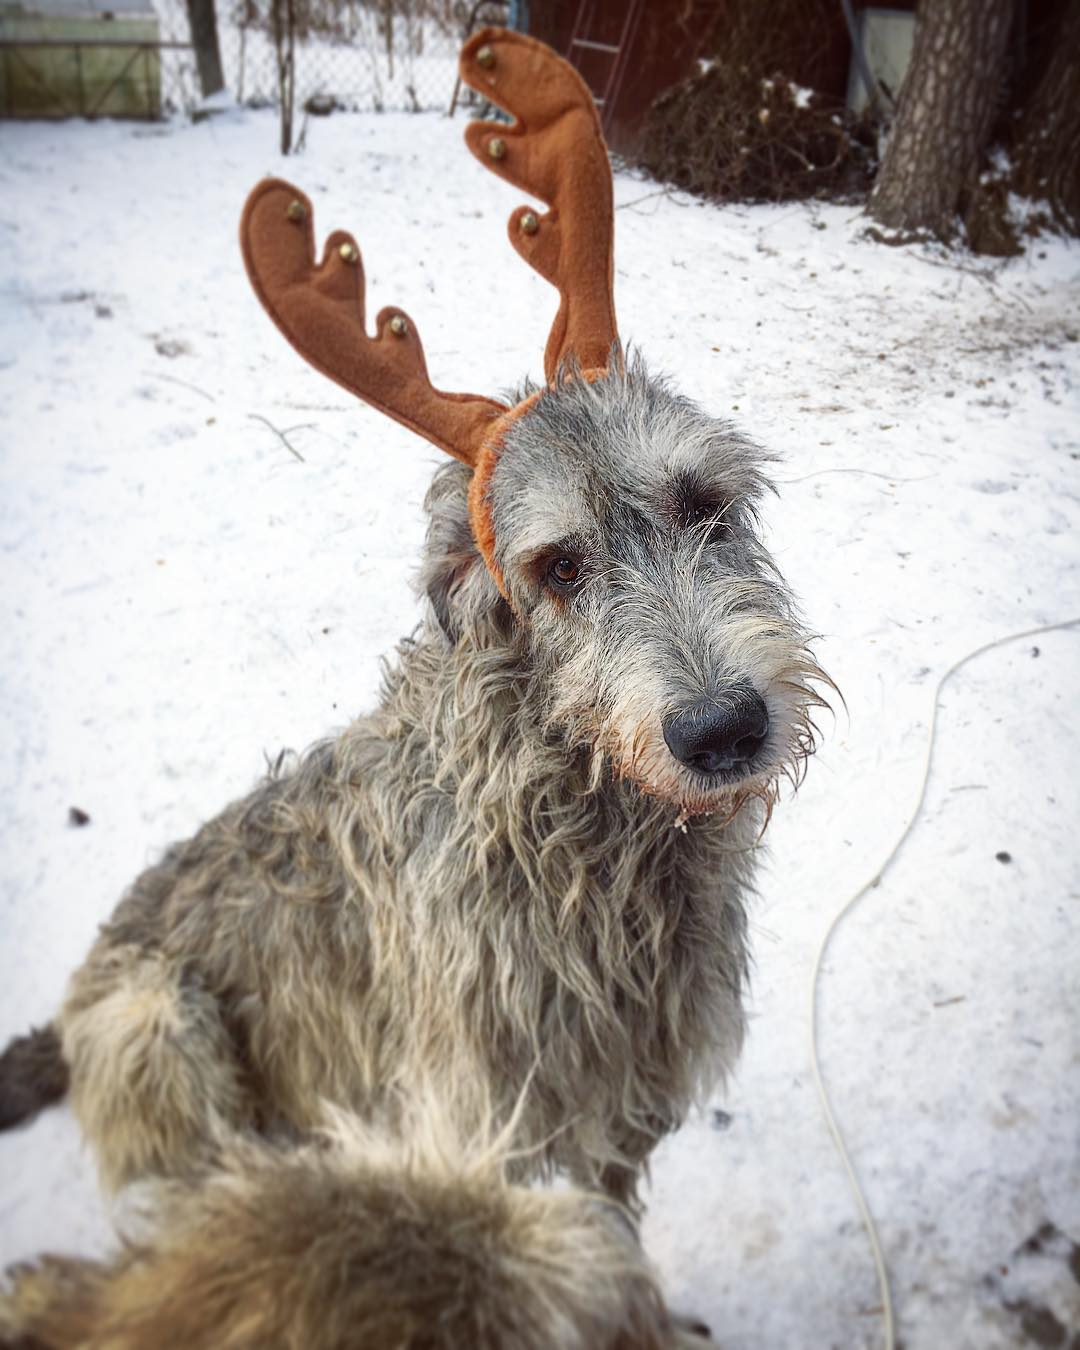 16 Irish Wolfhound Pics That'll Keep You Smiling 9